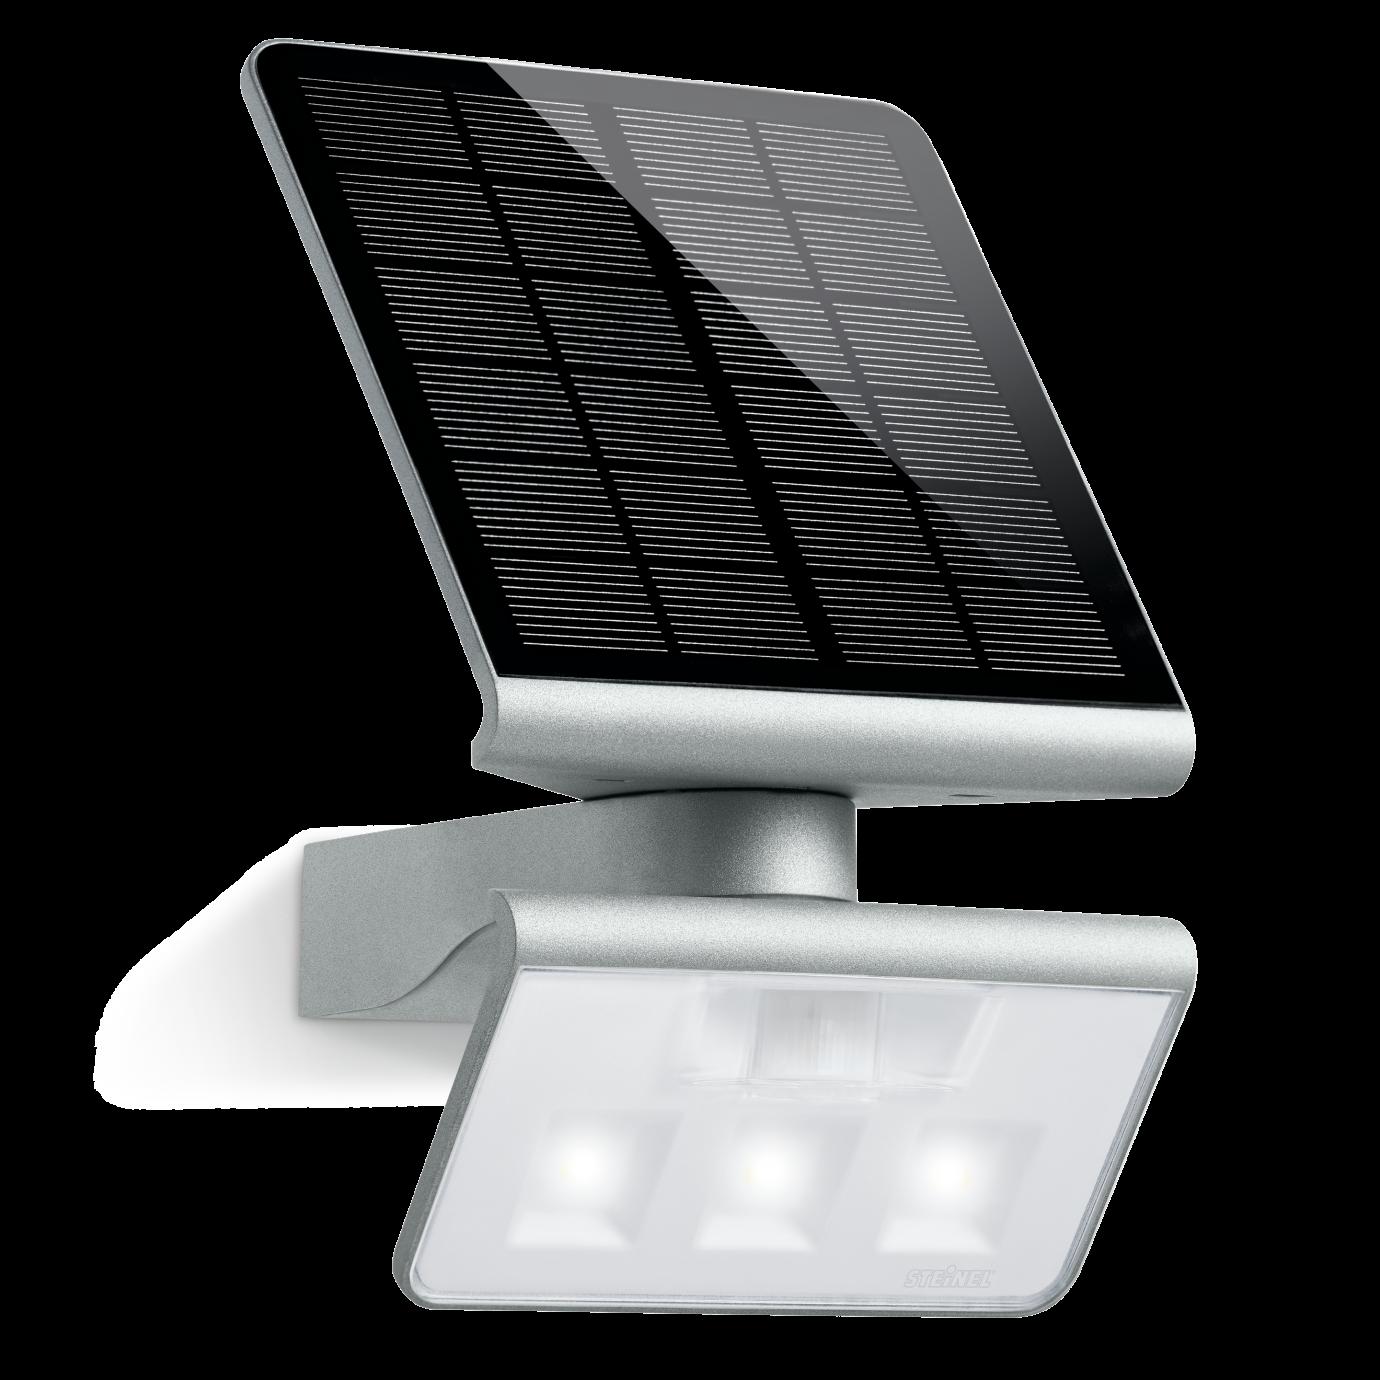 Steinel Lampa Solarna Led Z Czujnikiem Ruchu Xsolar L S 12w 4000k Srebrna St671013